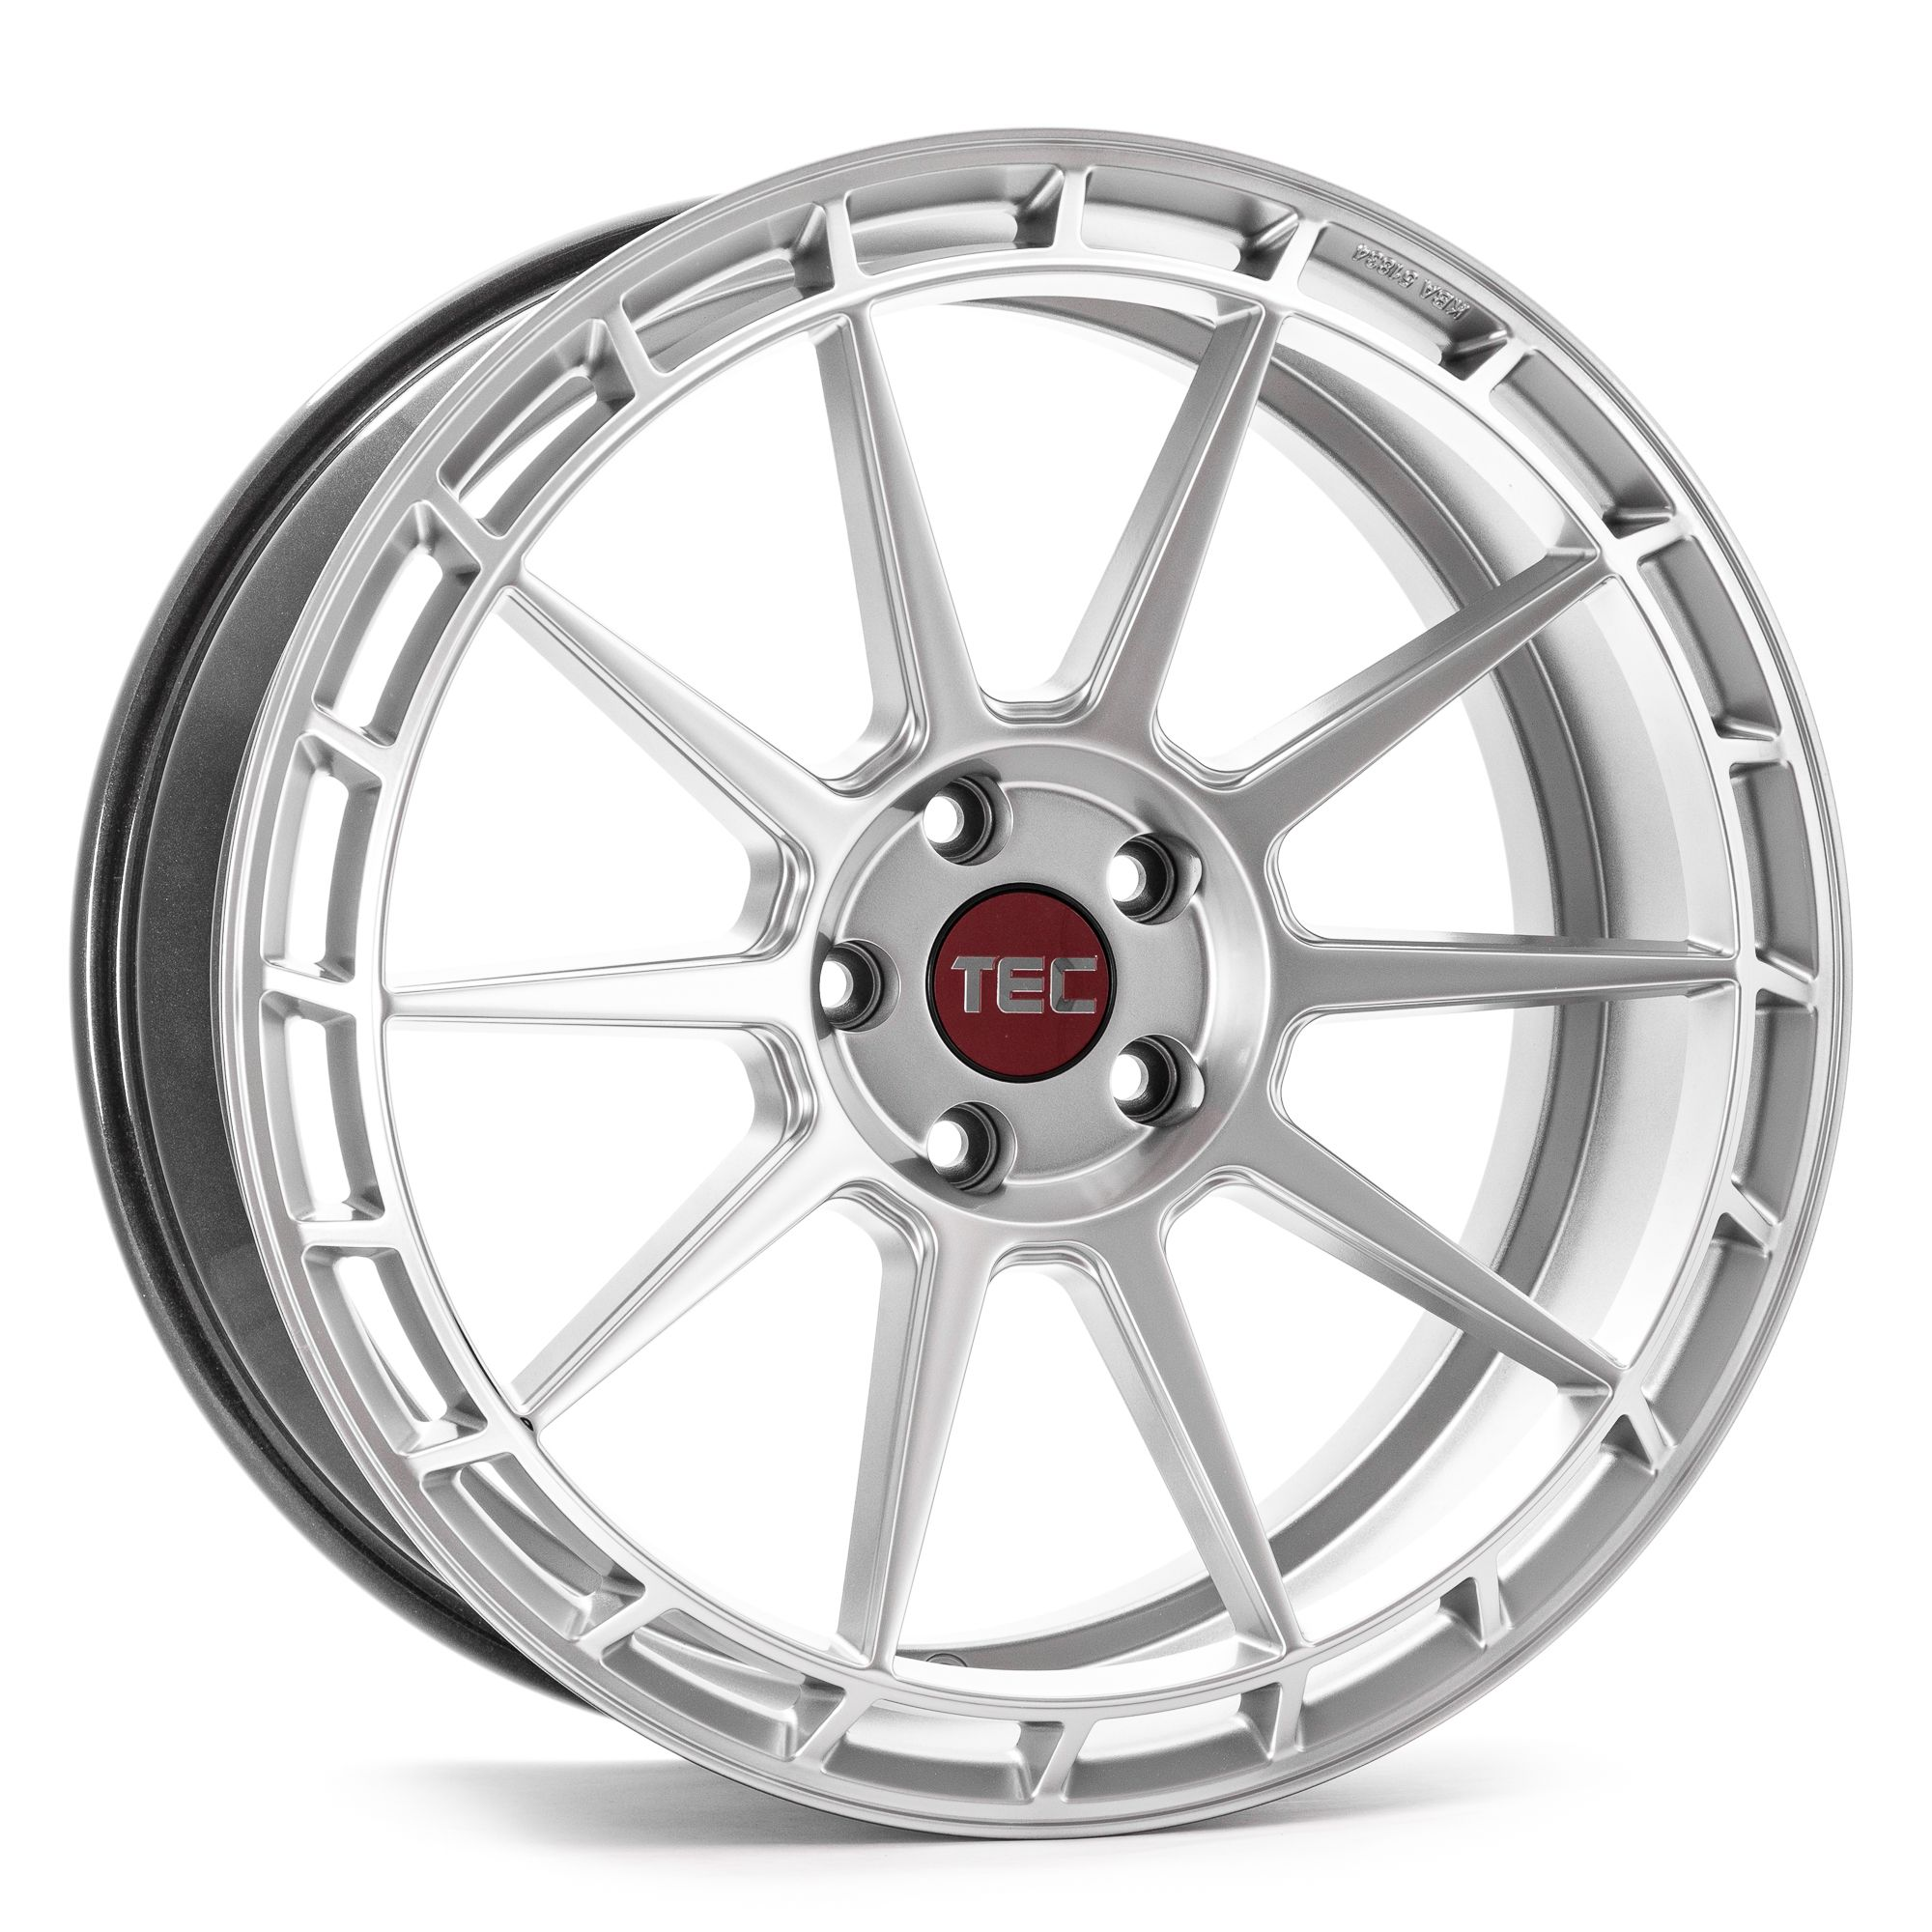 tec speedwheels gt8 felgen hyper silver silber in 20. Black Bedroom Furniture Sets. Home Design Ideas